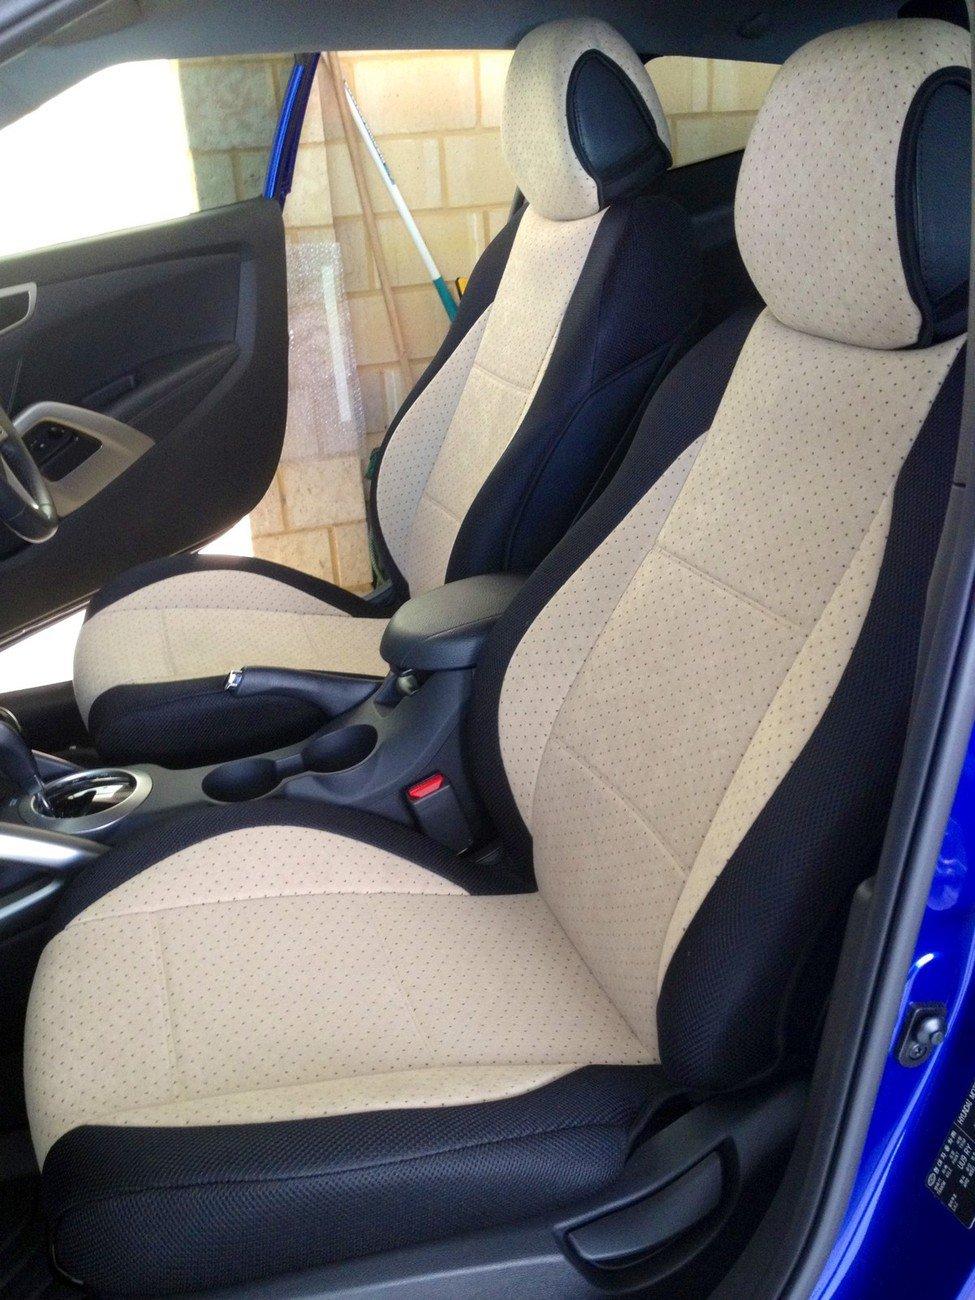 HONDA CR-V 2007�2012 TWO FRONT CUSTOM BEIGE/BLACK VELOUR SYNTHETIC CAR SEAT COVERS